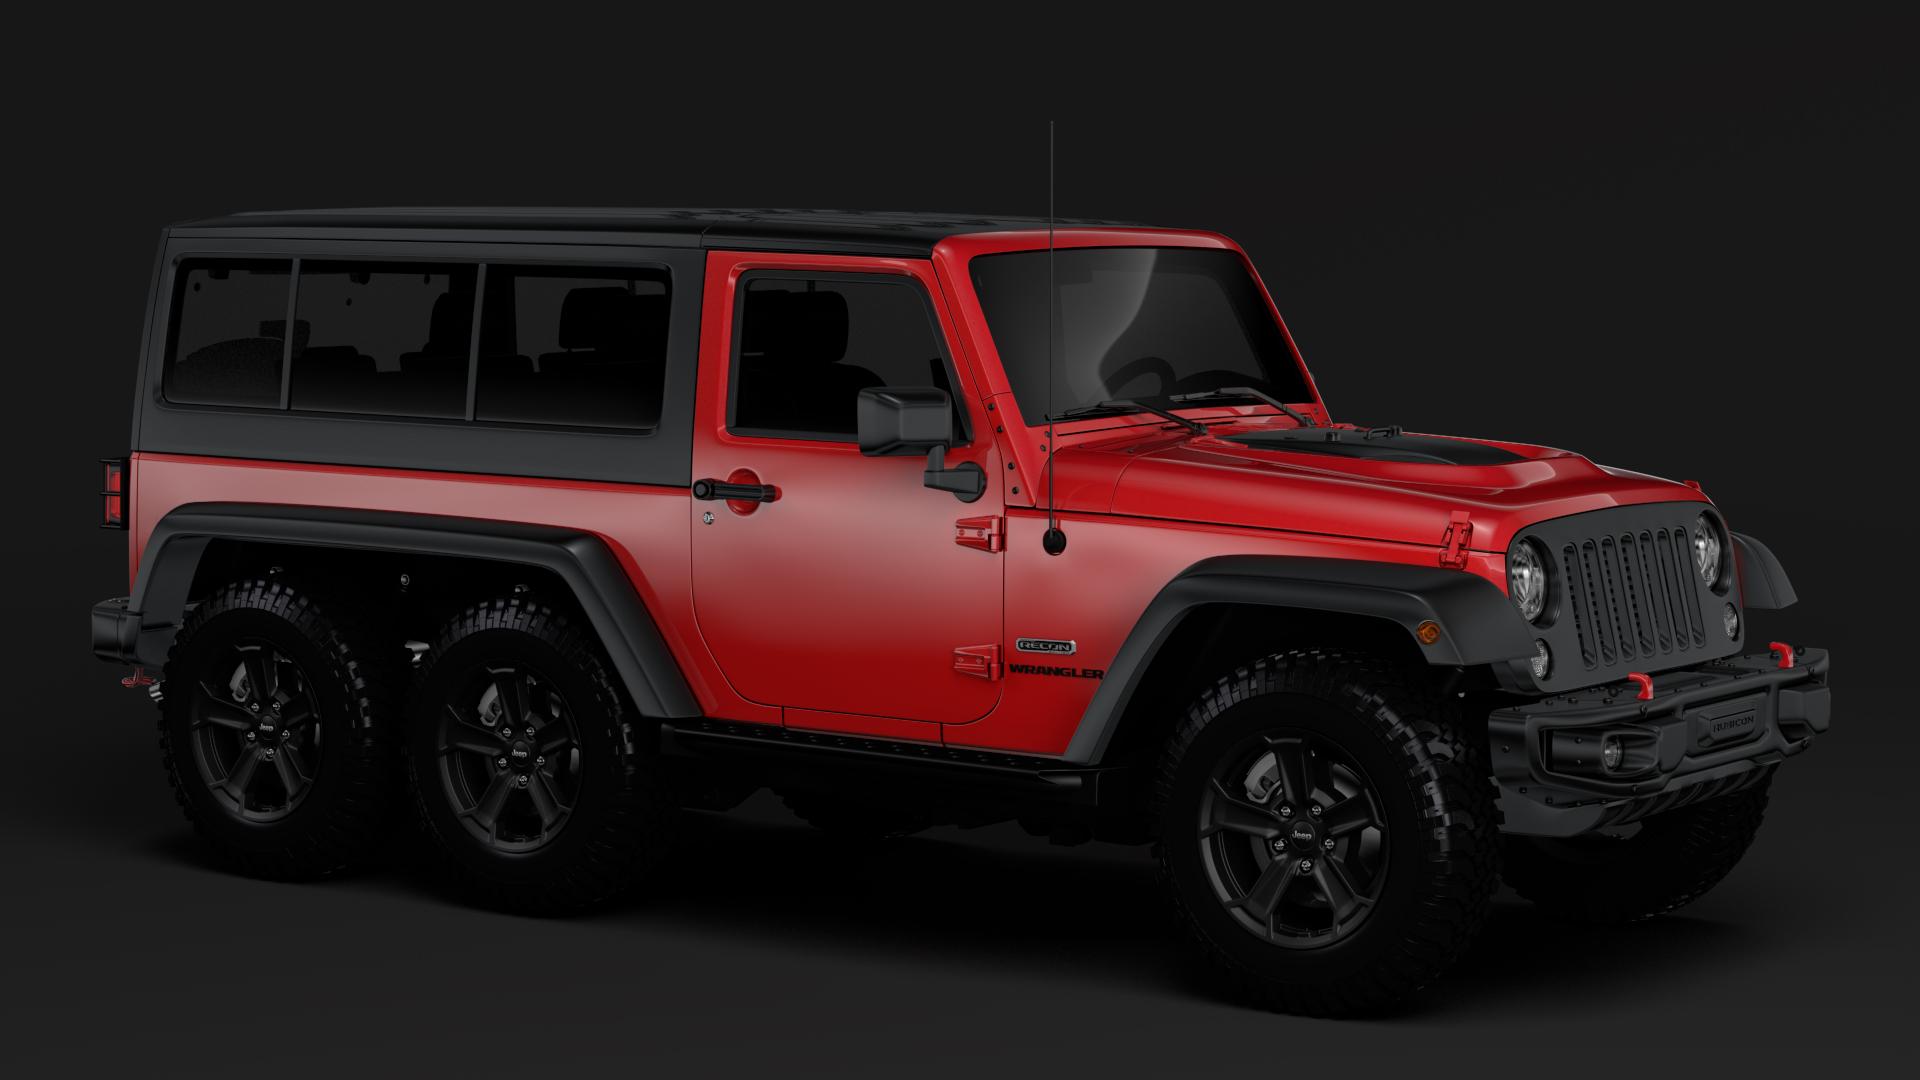 jeep wrangler 6x6 rubicon recon jk 2017 3d model buy jeep wrangler 6x6 rubicon recon jk 2017. Black Bedroom Furniture Sets. Home Design Ideas